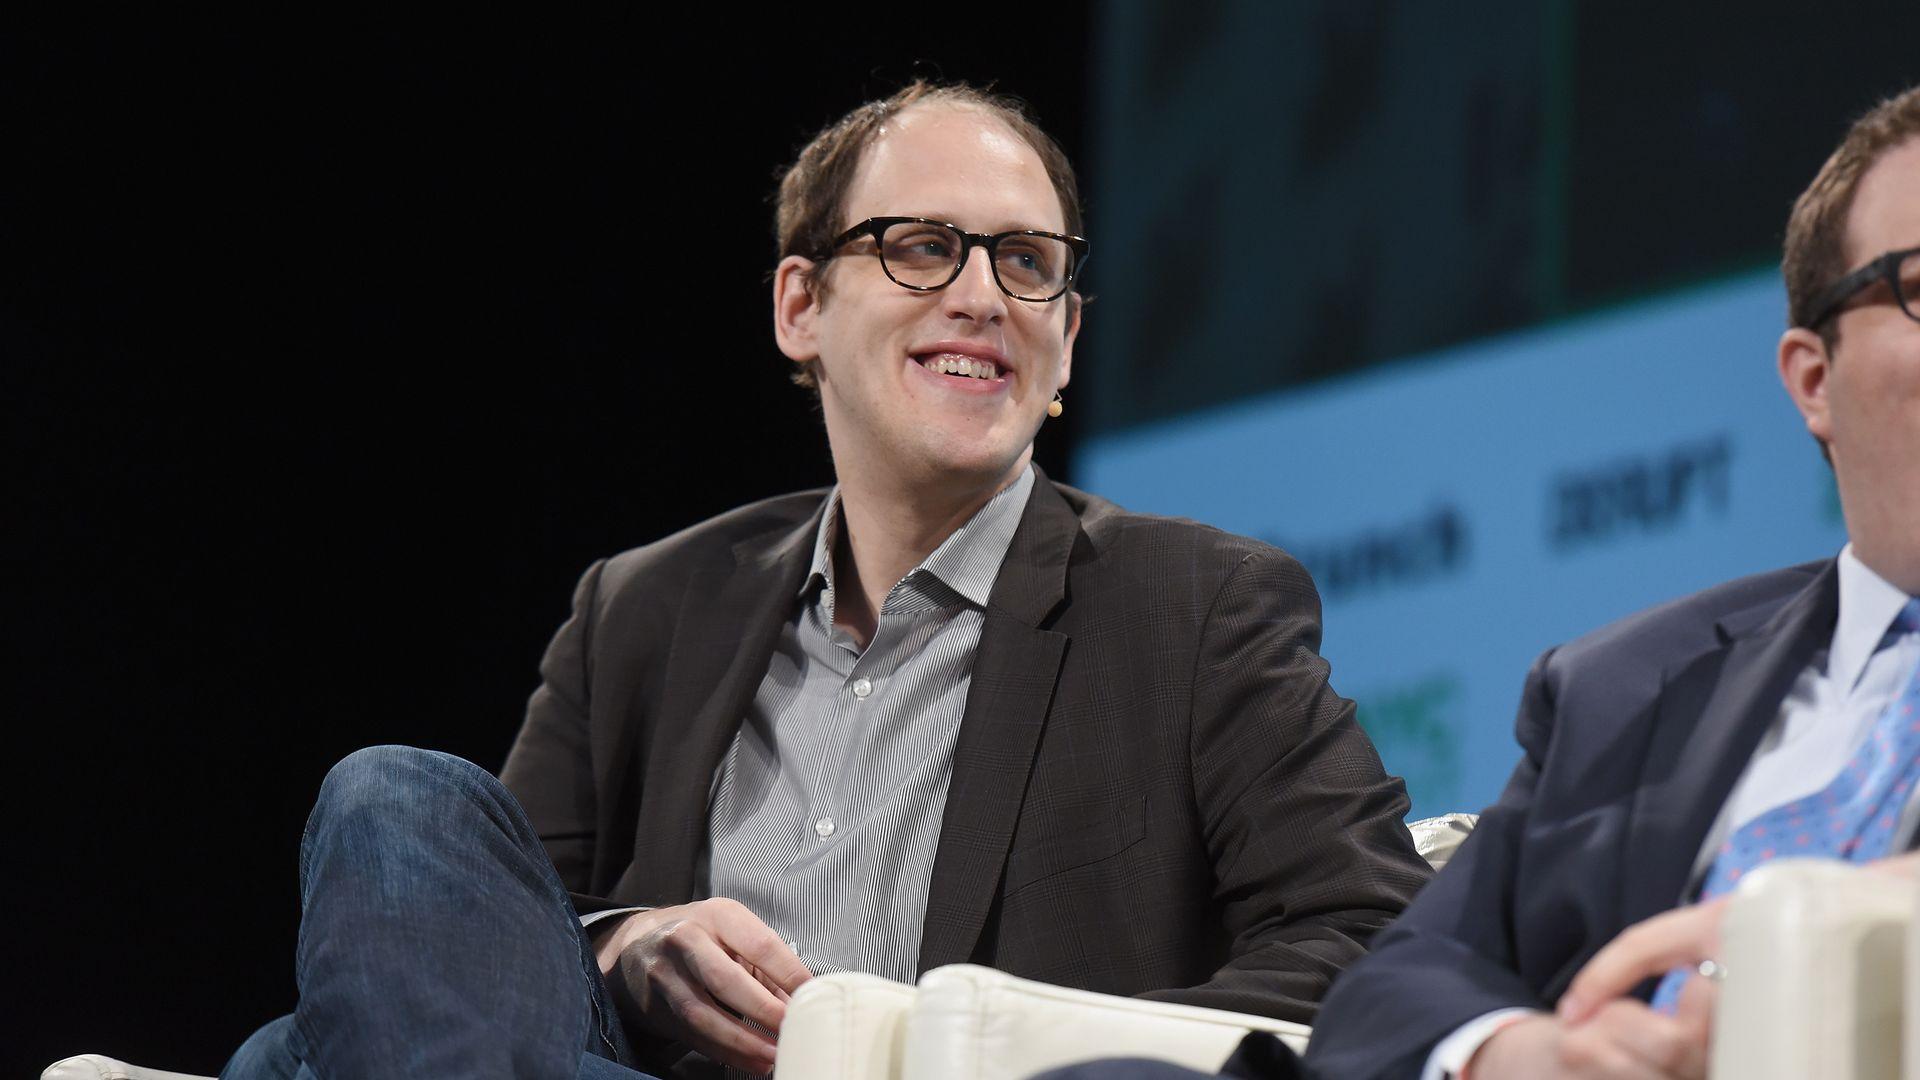 Dataminr raises new funds at $1 6 billion valuation - Axios